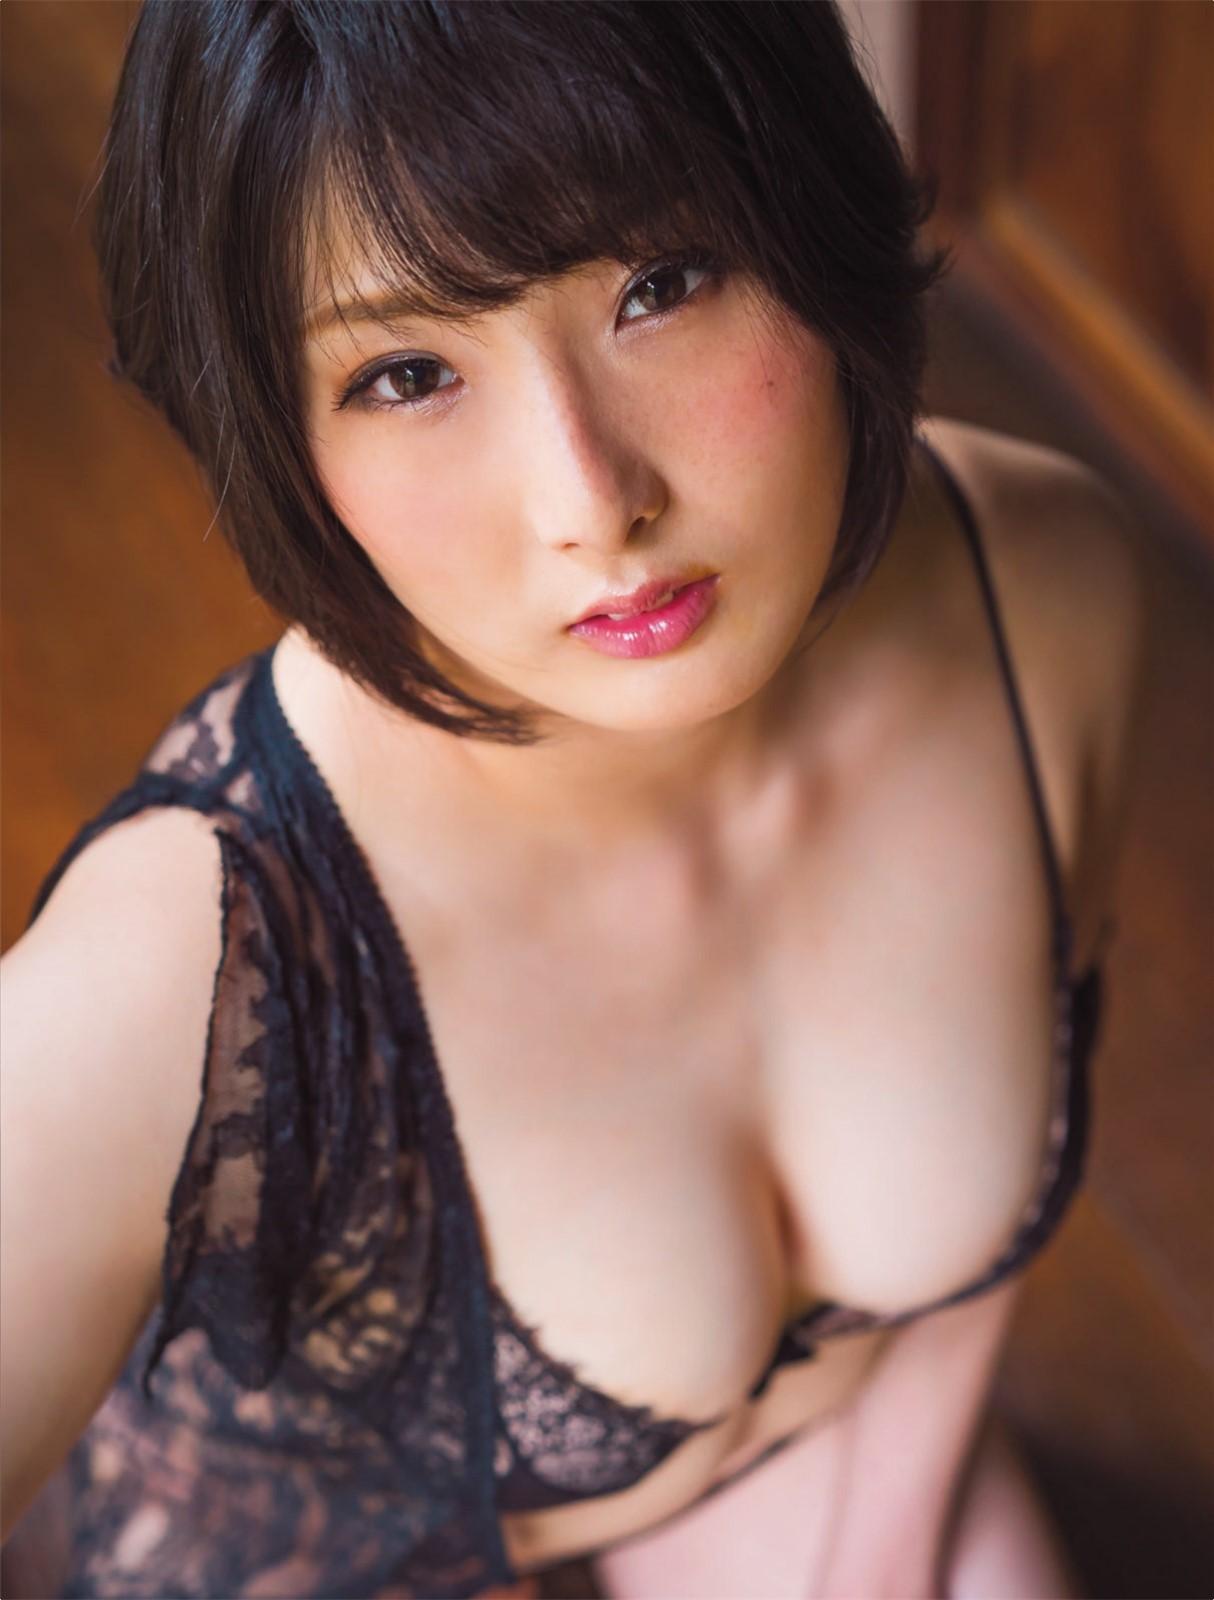 Makoto 真琴, Shukan SPA! 2017.08.29 (週刊スパ 2017年08月29日号)